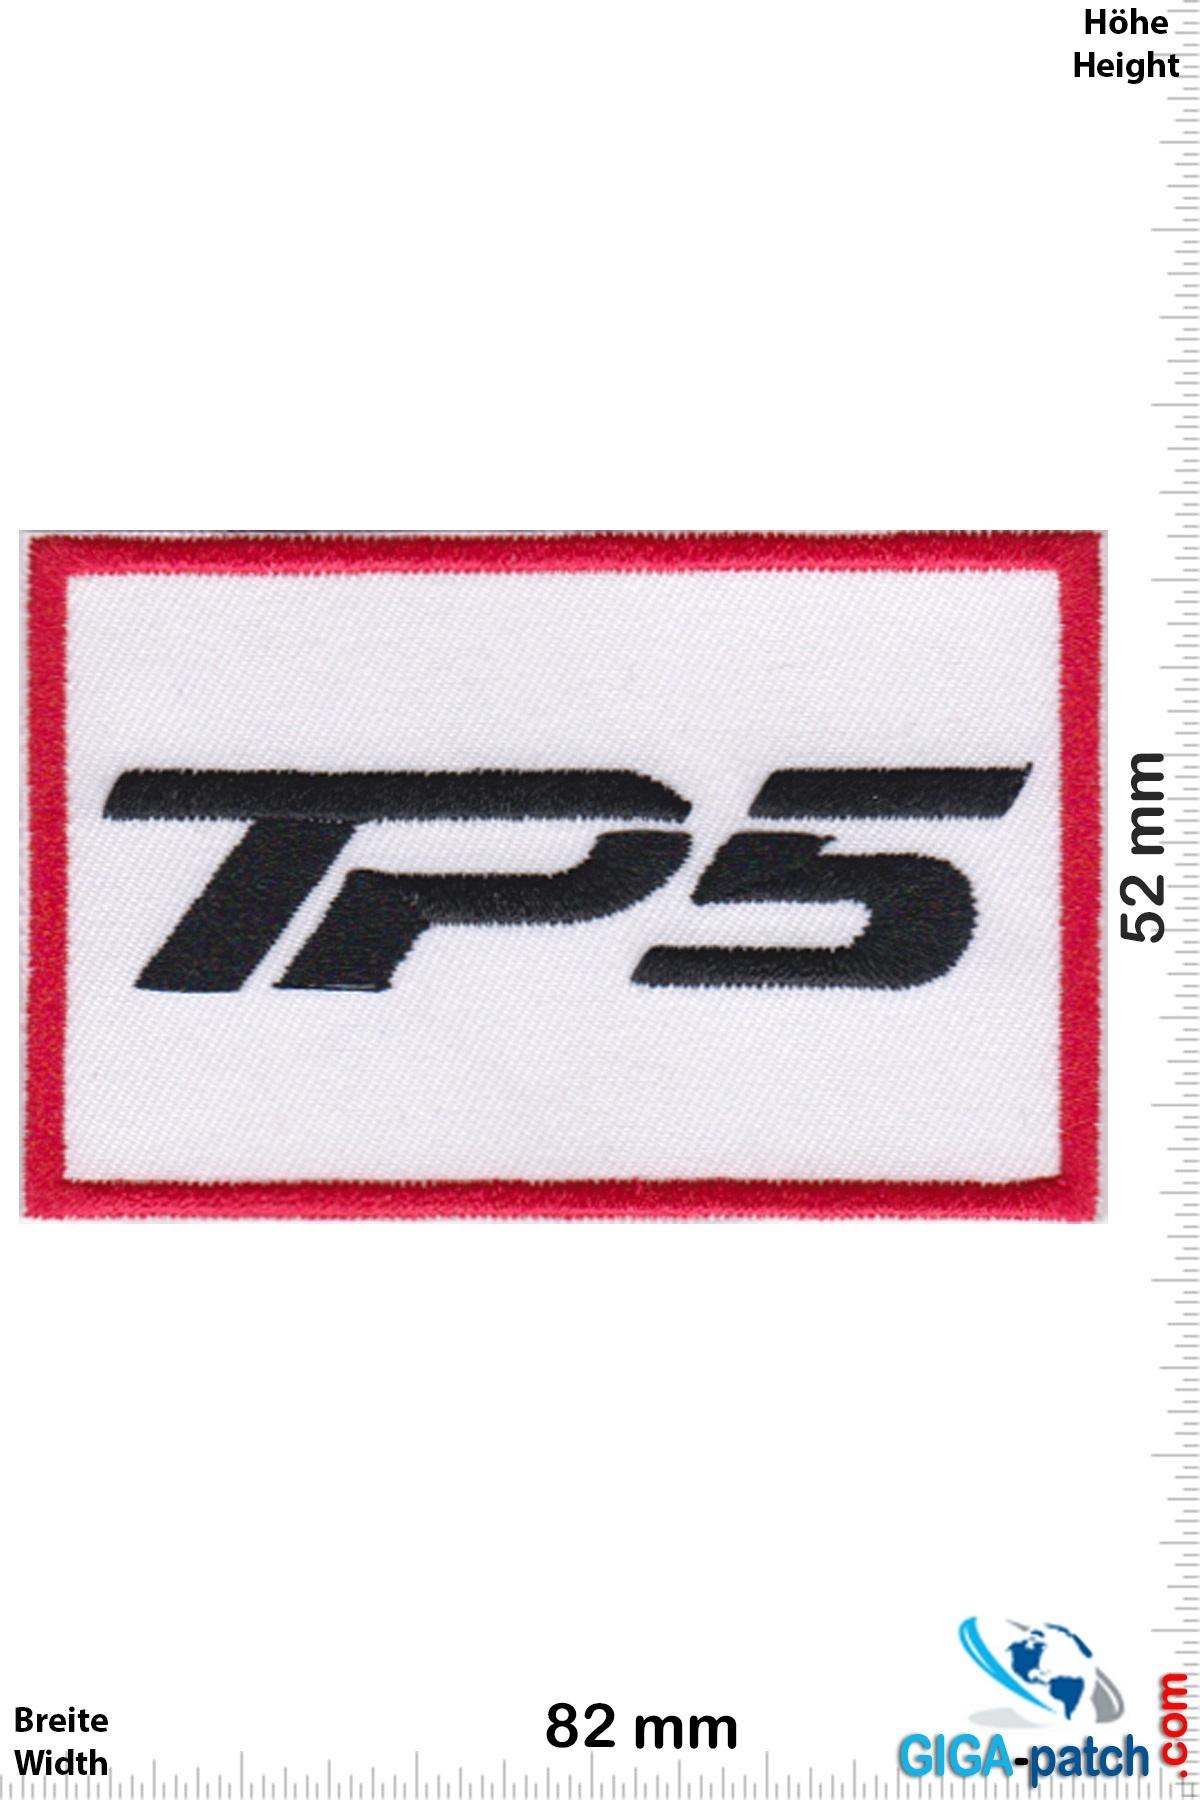 TaylorMade TP5 - Golf